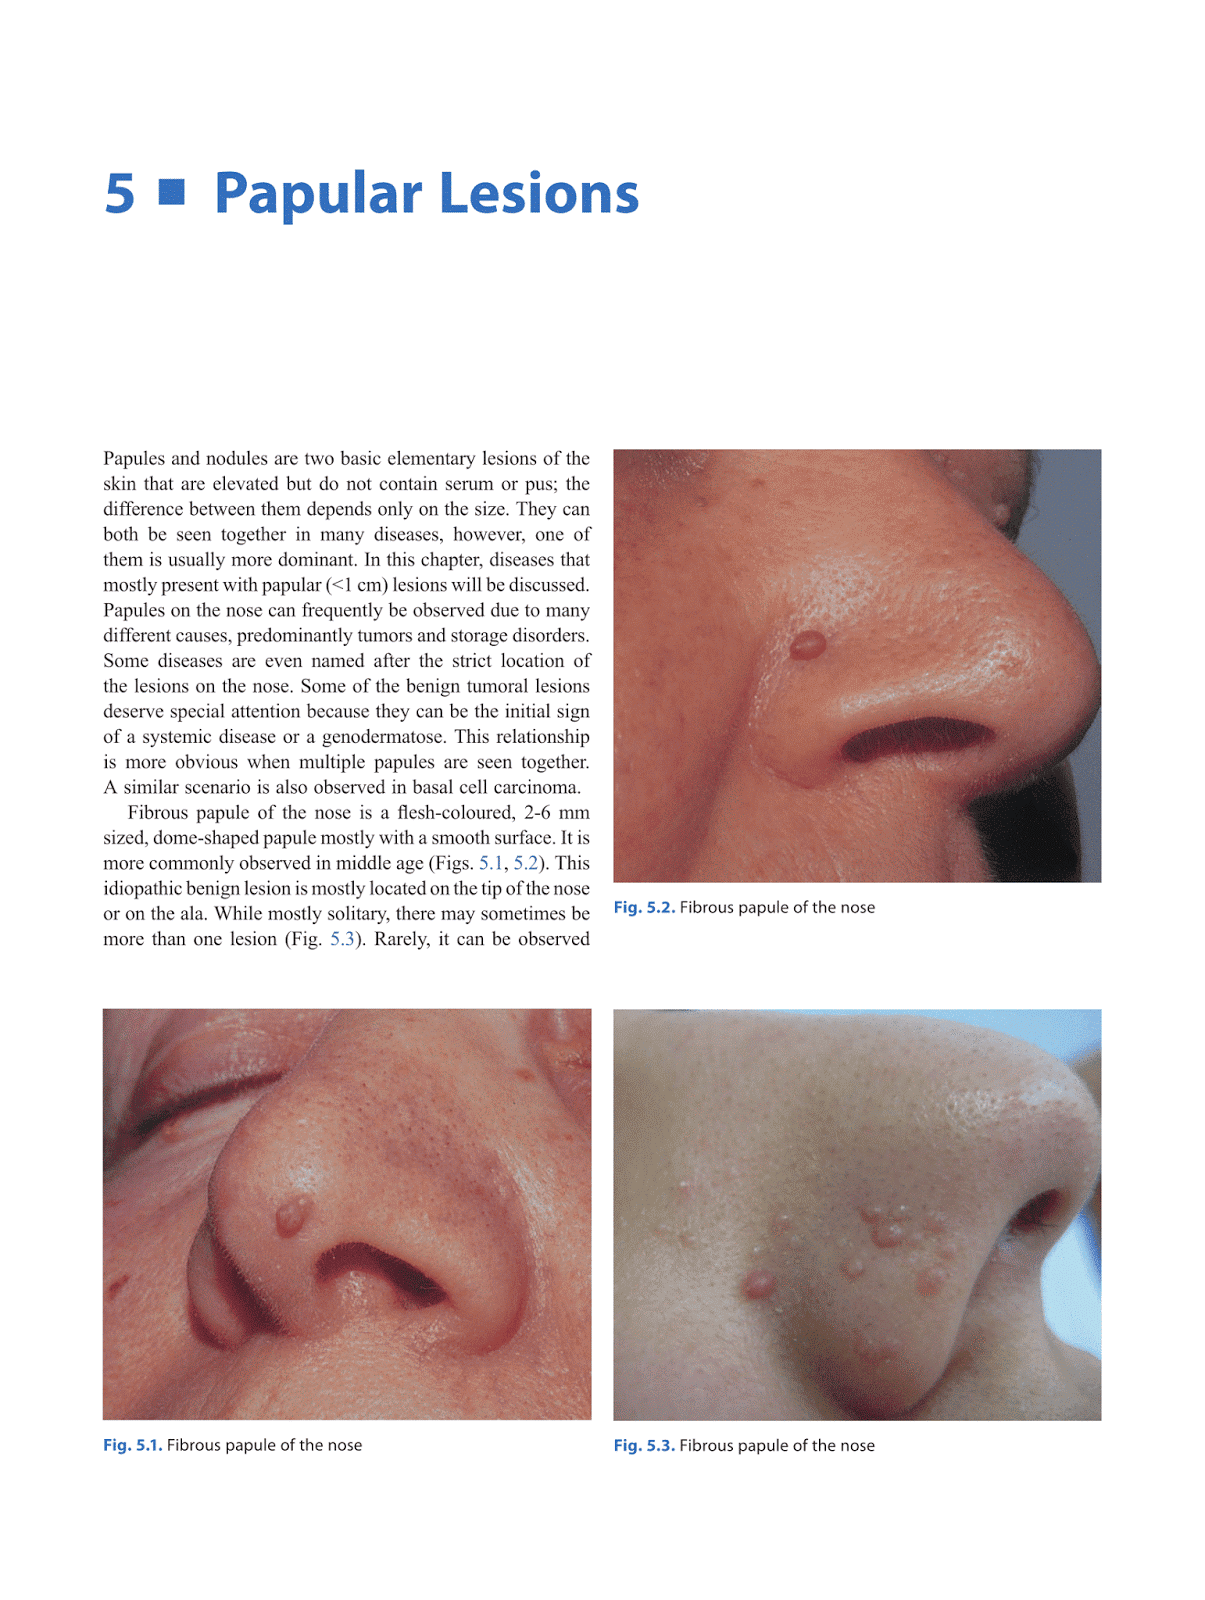 Otolaryngology by Alexandros G Sfakianakis: Lesions of the